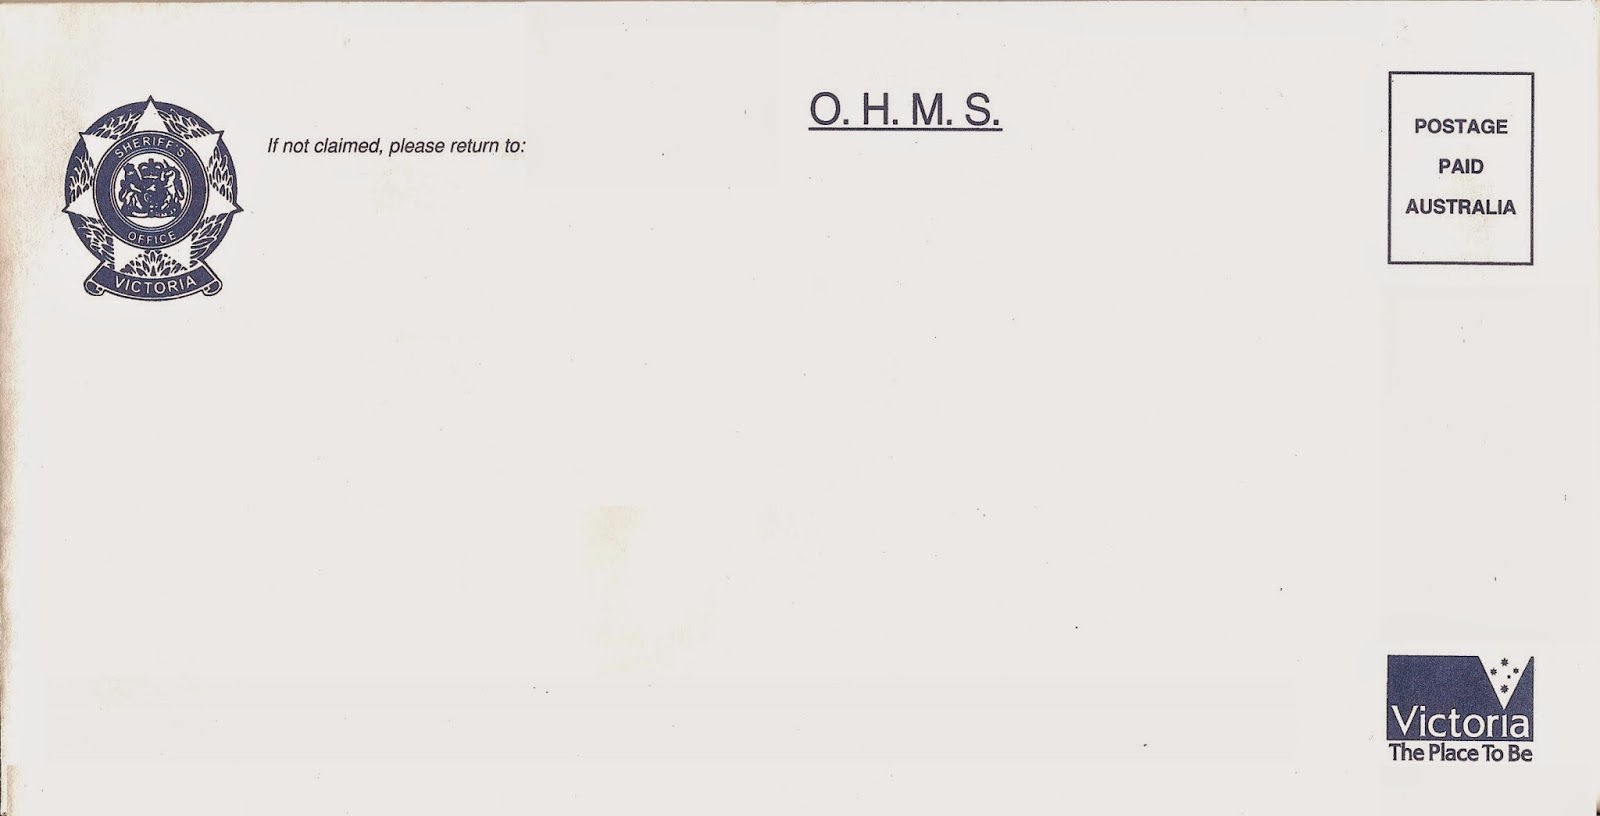 Corporate Australia: Sheriff OHMS